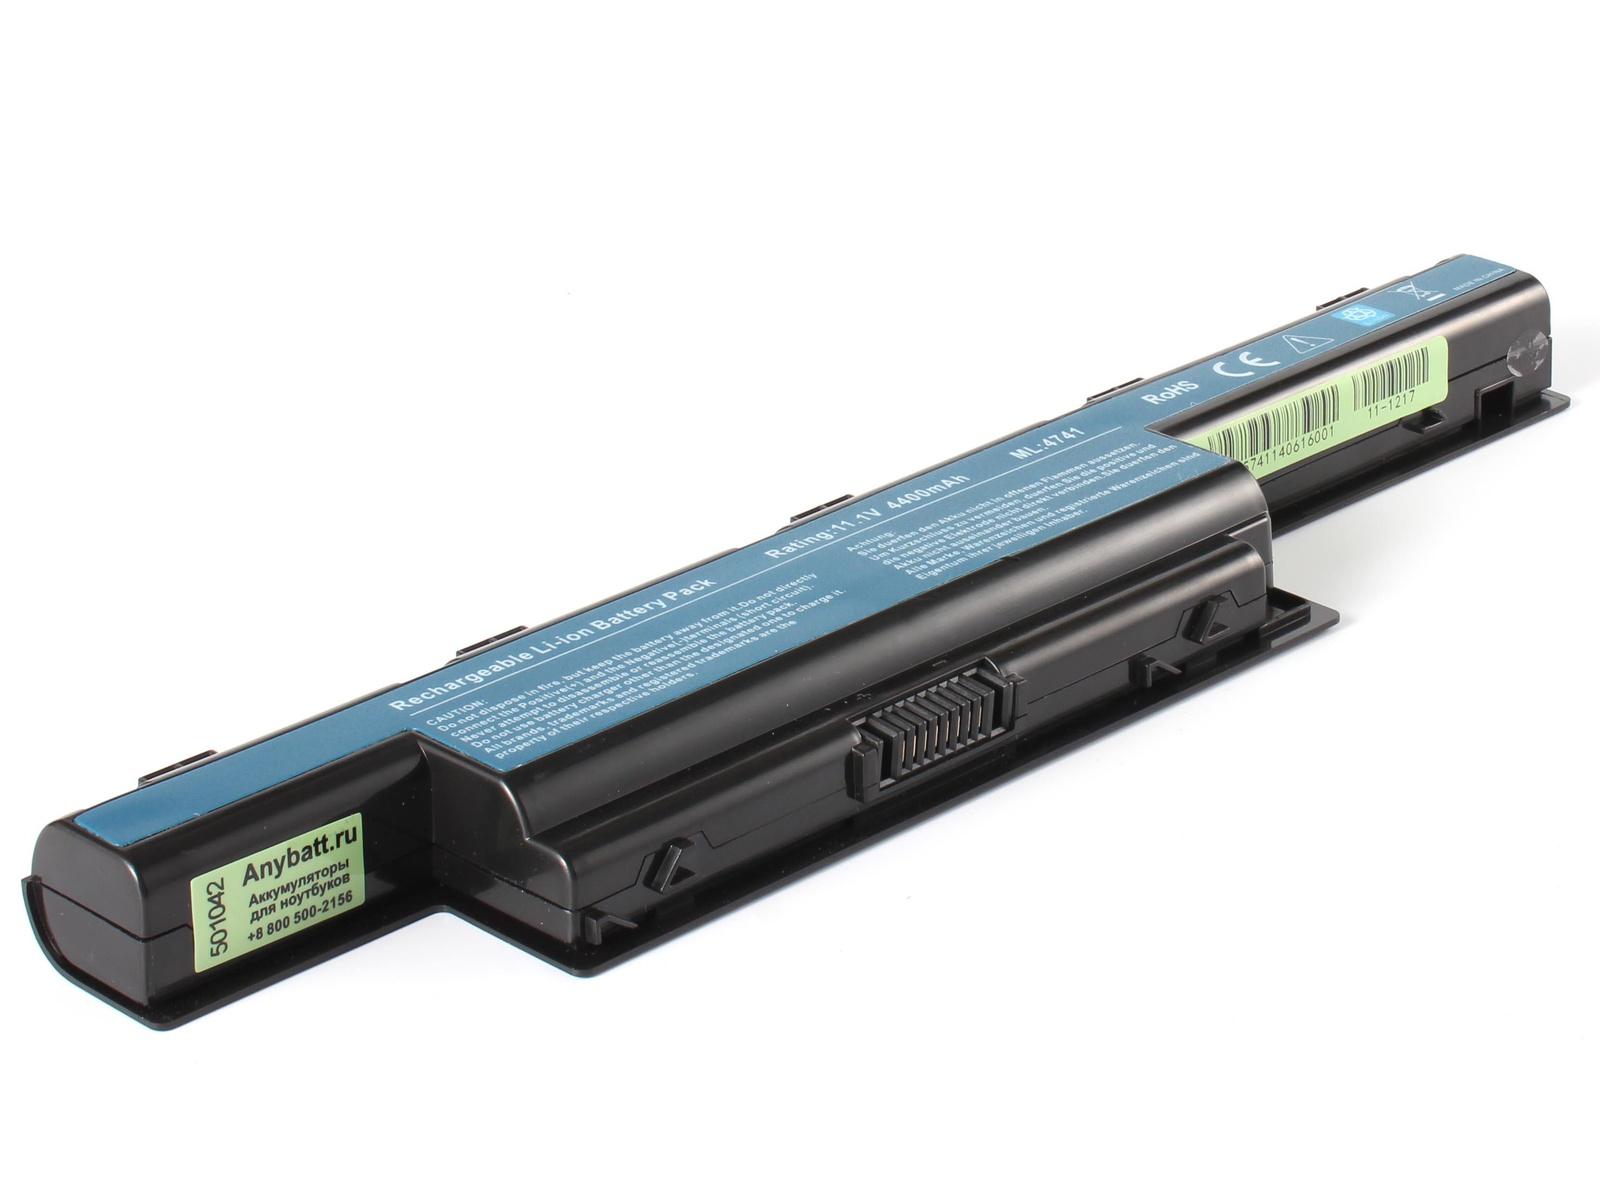 Аккумулятор для ноутбука AnyBatt для Acer Aspire V3-772G-747a8G1TMamm, Aspire 5349-B812G32Mnkk, TravelMate 5760Z, TravelMate 5740G, Aspire 5741G-434G32Misk, Aspire 5742G-373G25Mikk, Aspire 5750G-2434G64Mnkk